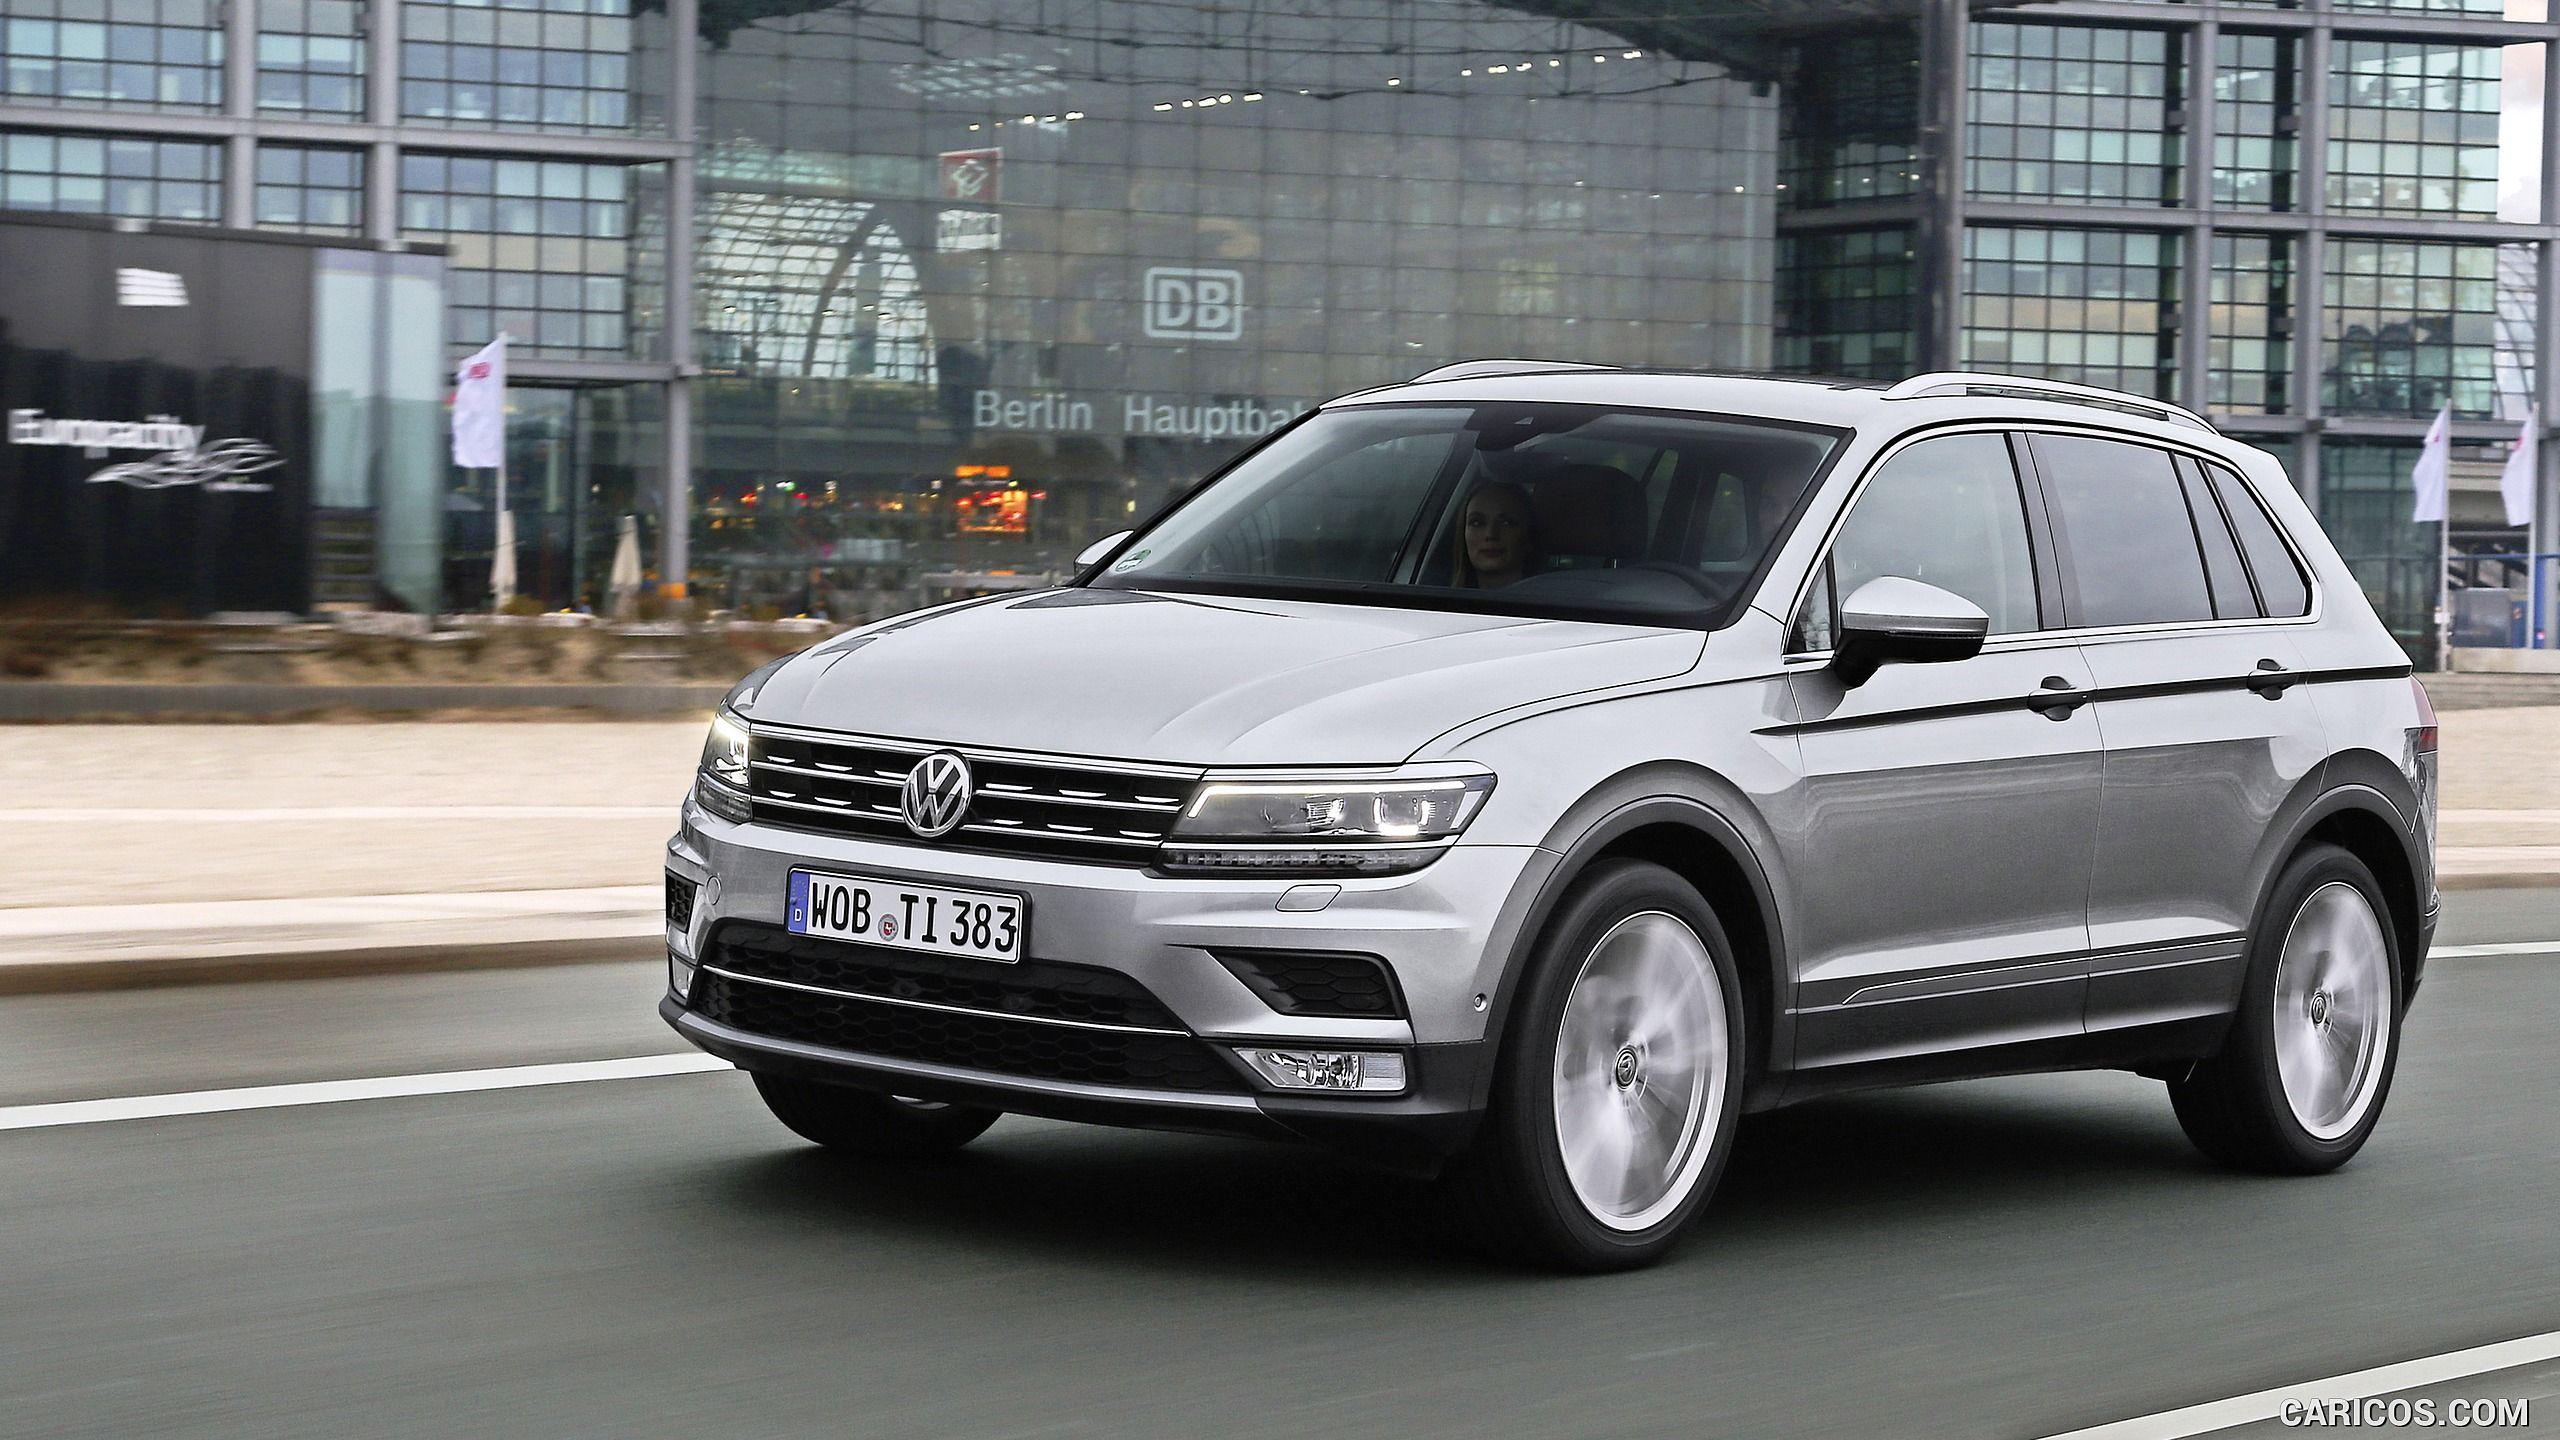 2017 Volkswagen Tiguan Volkswagen Suv Suv Car